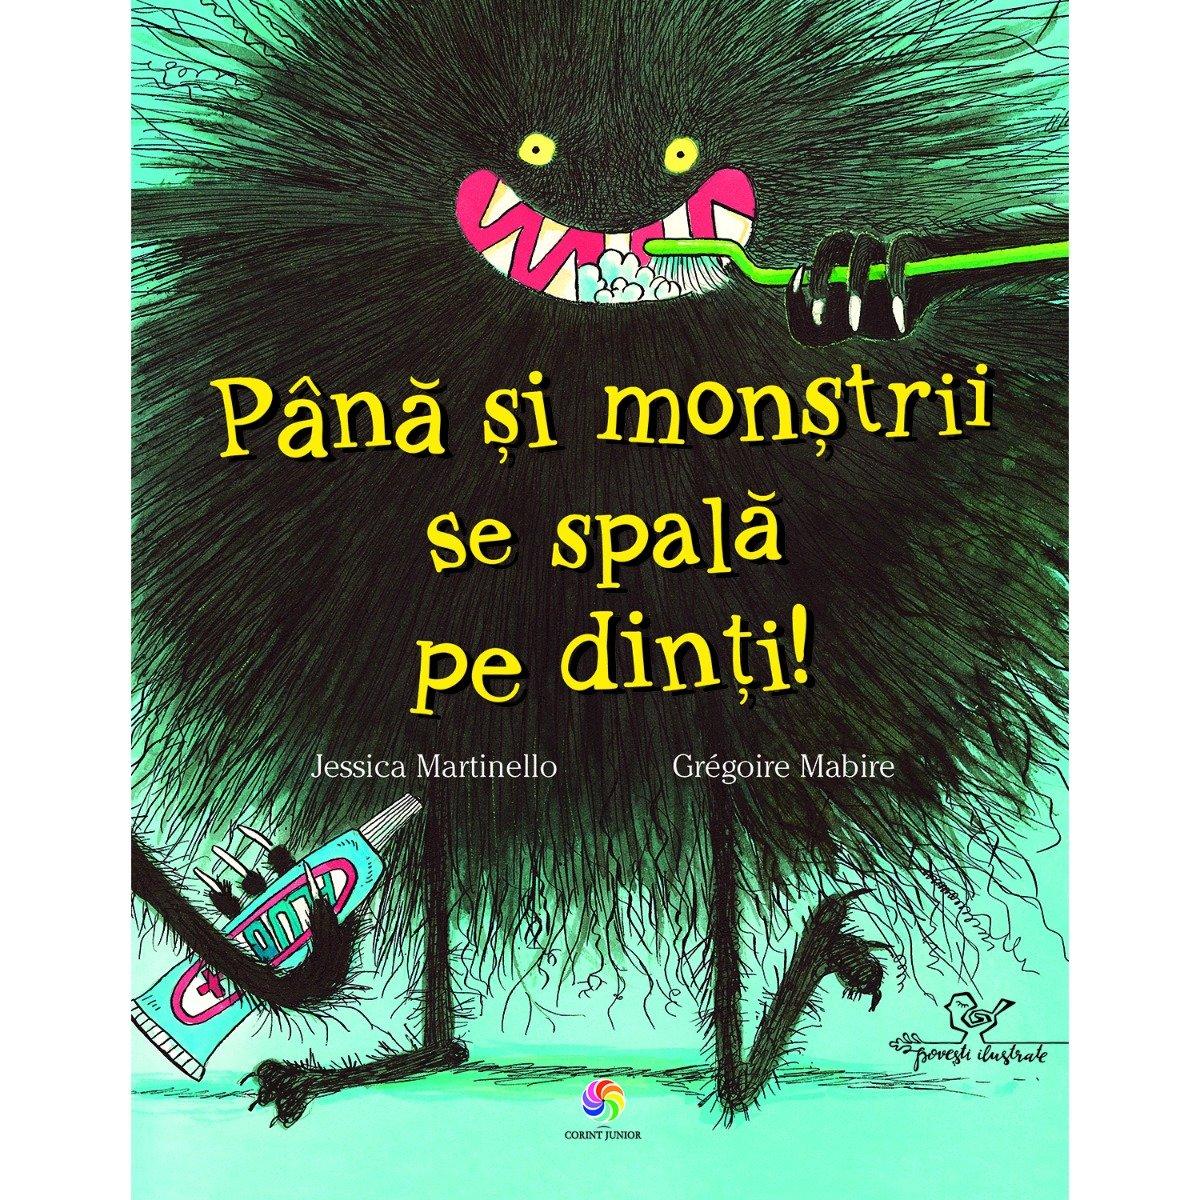 Carte Editura Corint, Pana si monstrii se spala pe dinti, Jessica Martinello, Gregoire Mabire